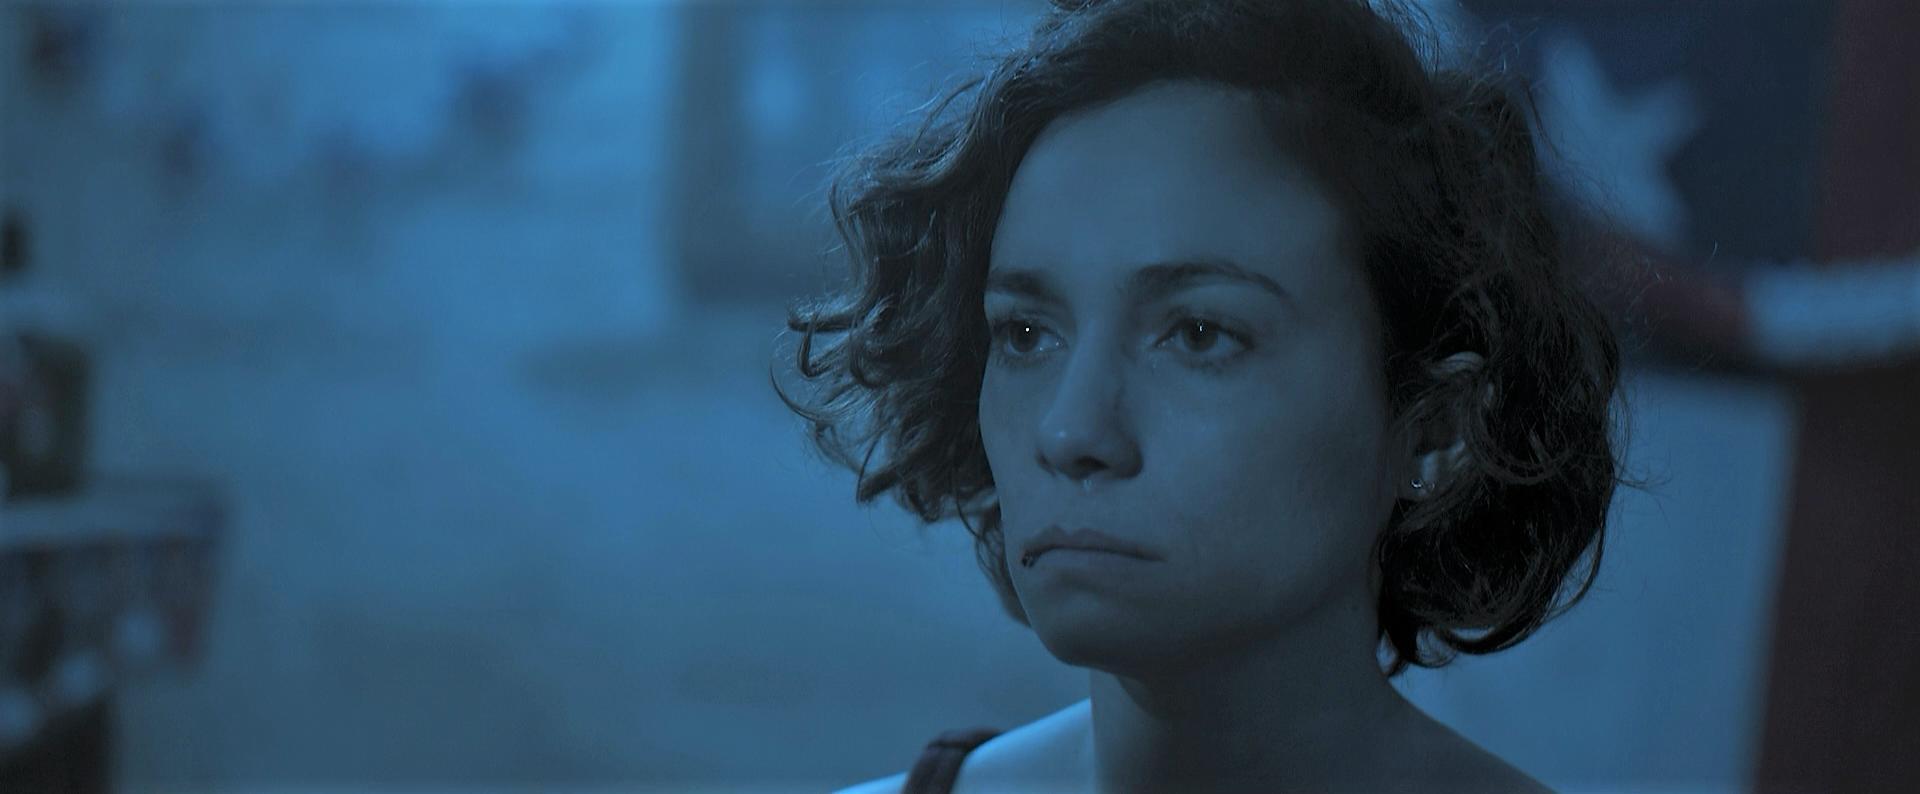 Catalina Martin in Trauma (2017)